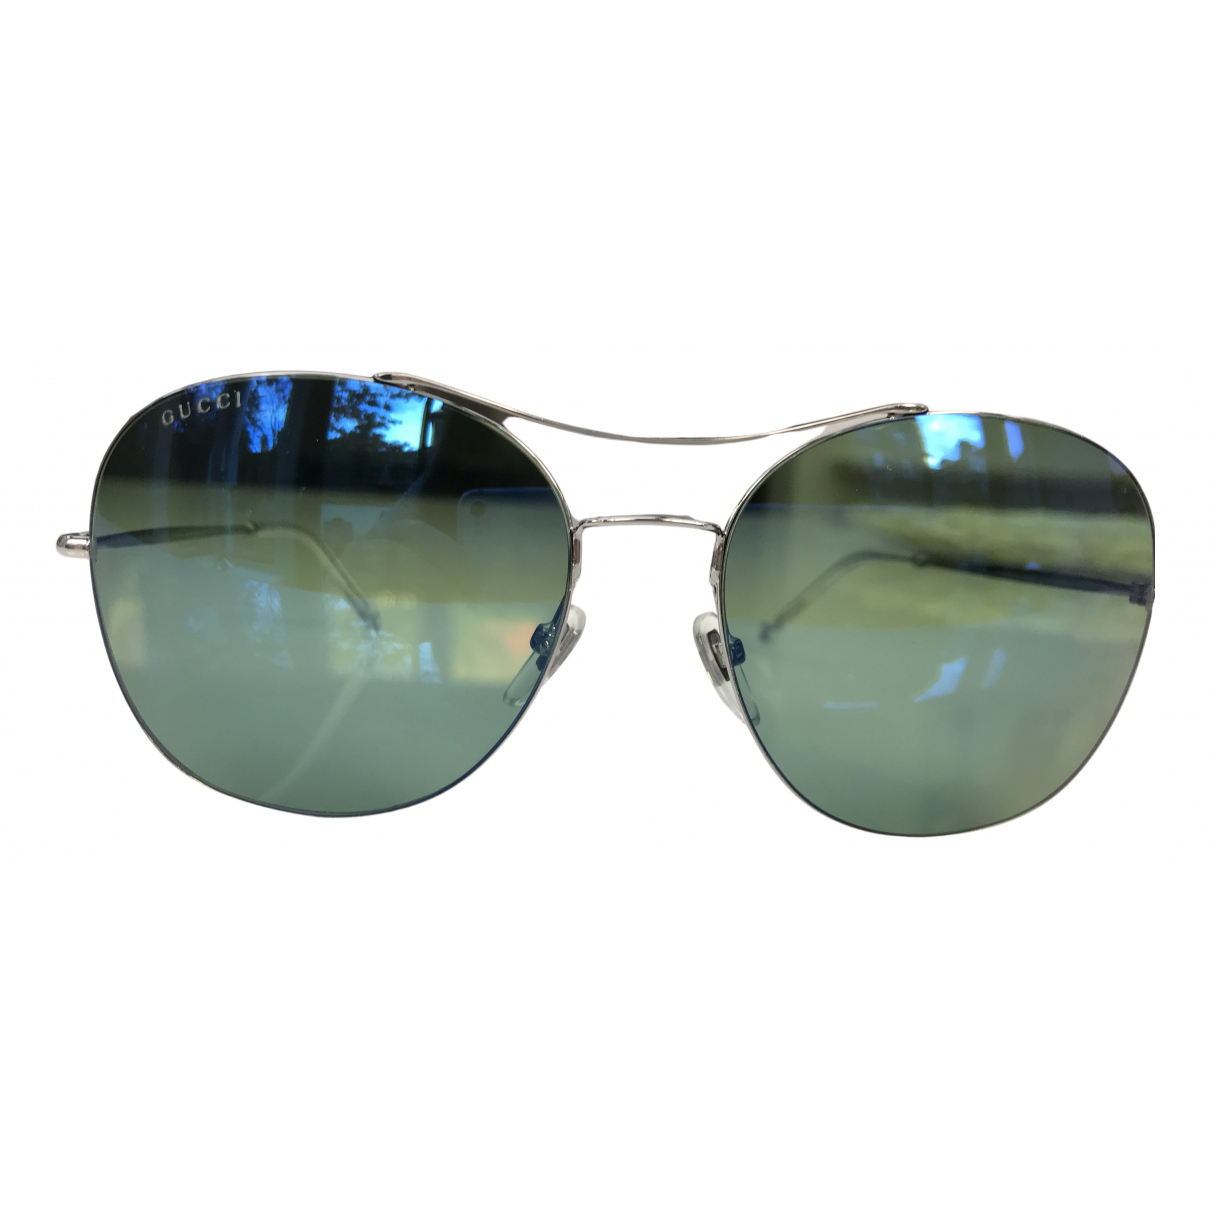 Gucci N Blue Metal Sunglasses for Women N